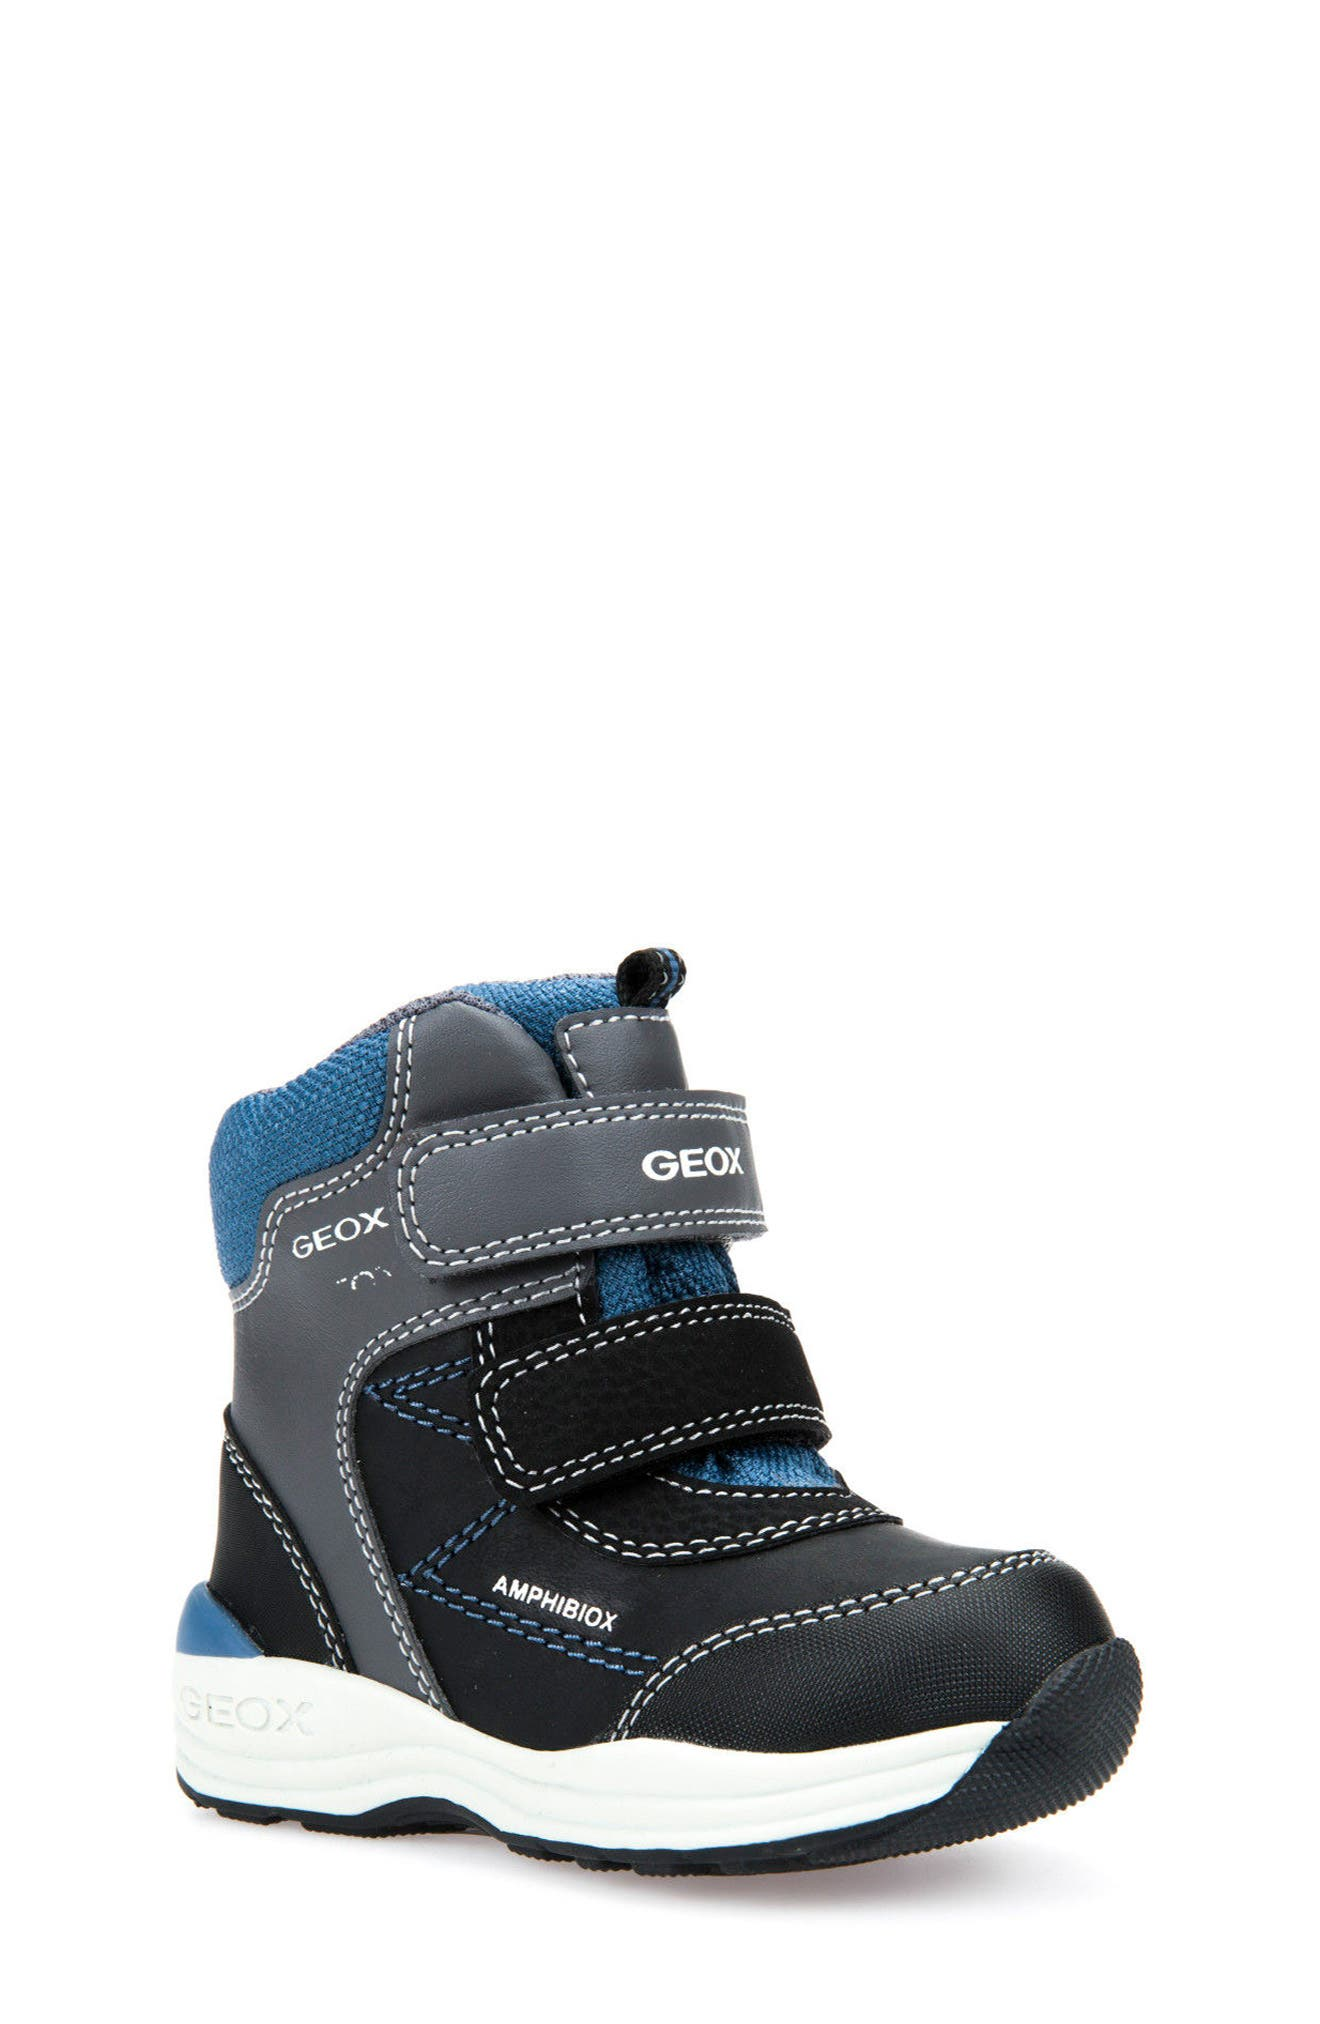 Gulp ABX Waterproof Boot,                         Main,                         color, Dark Grey/ Avio